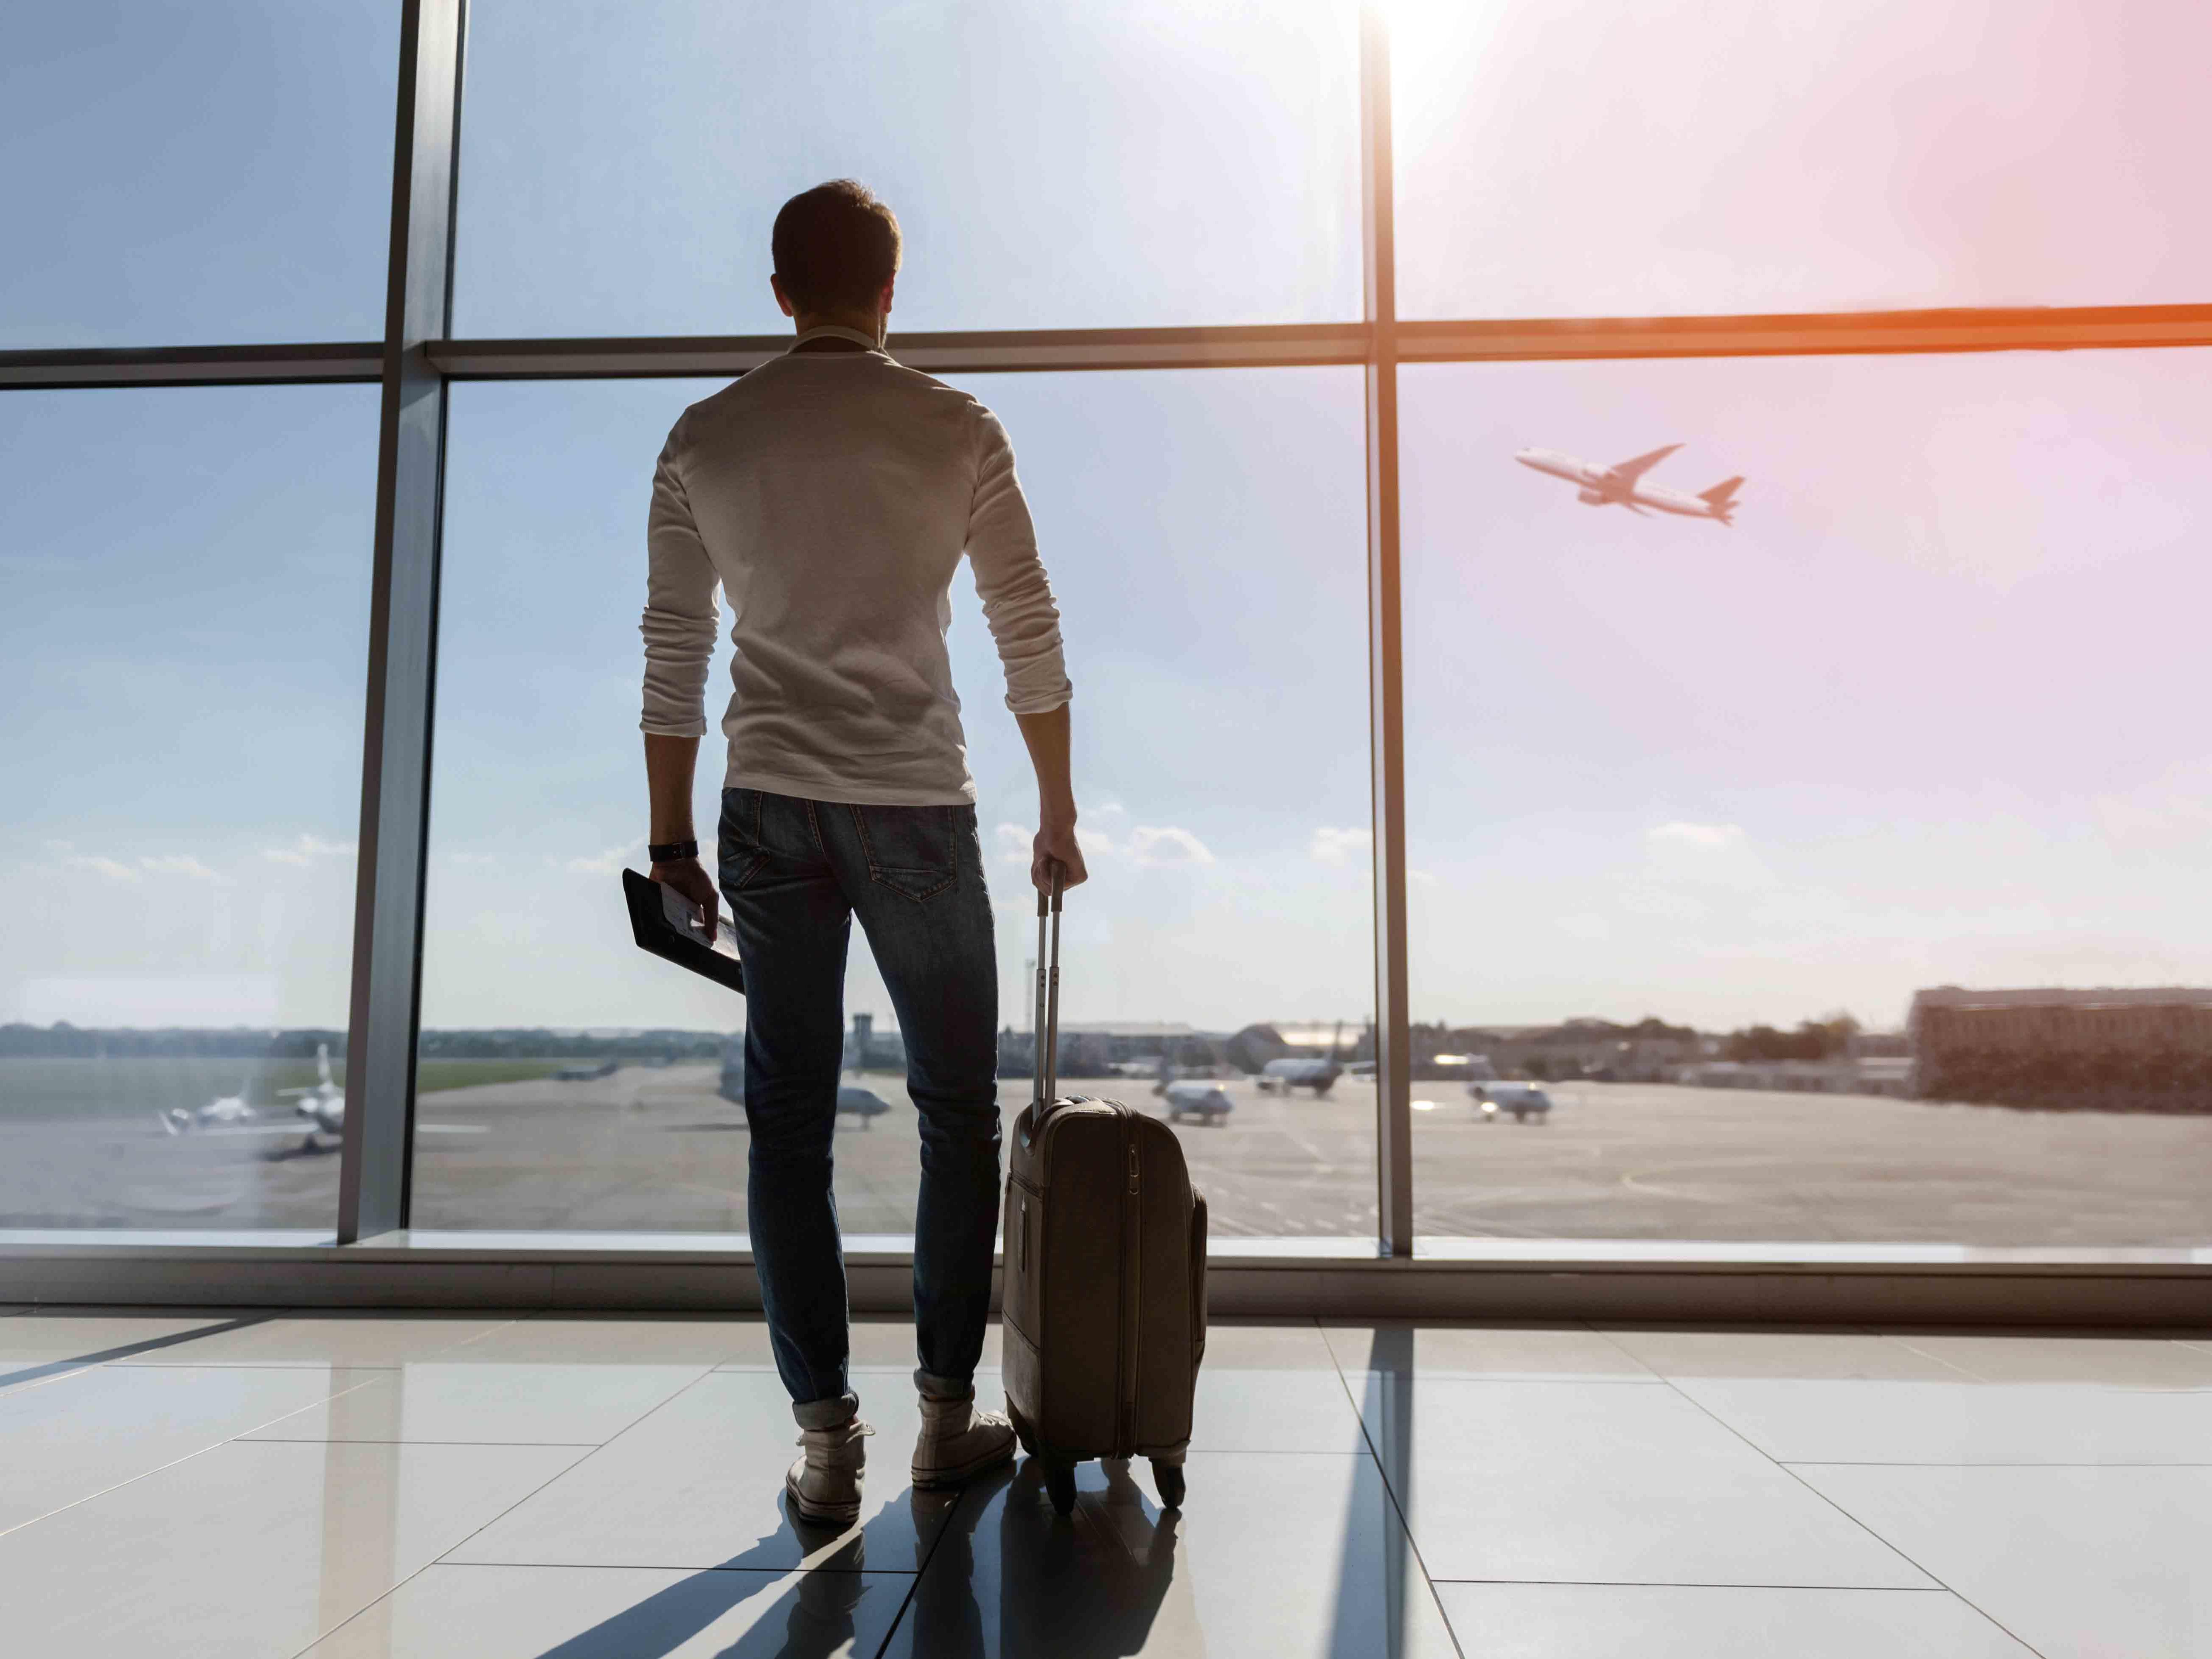 Men at the airport